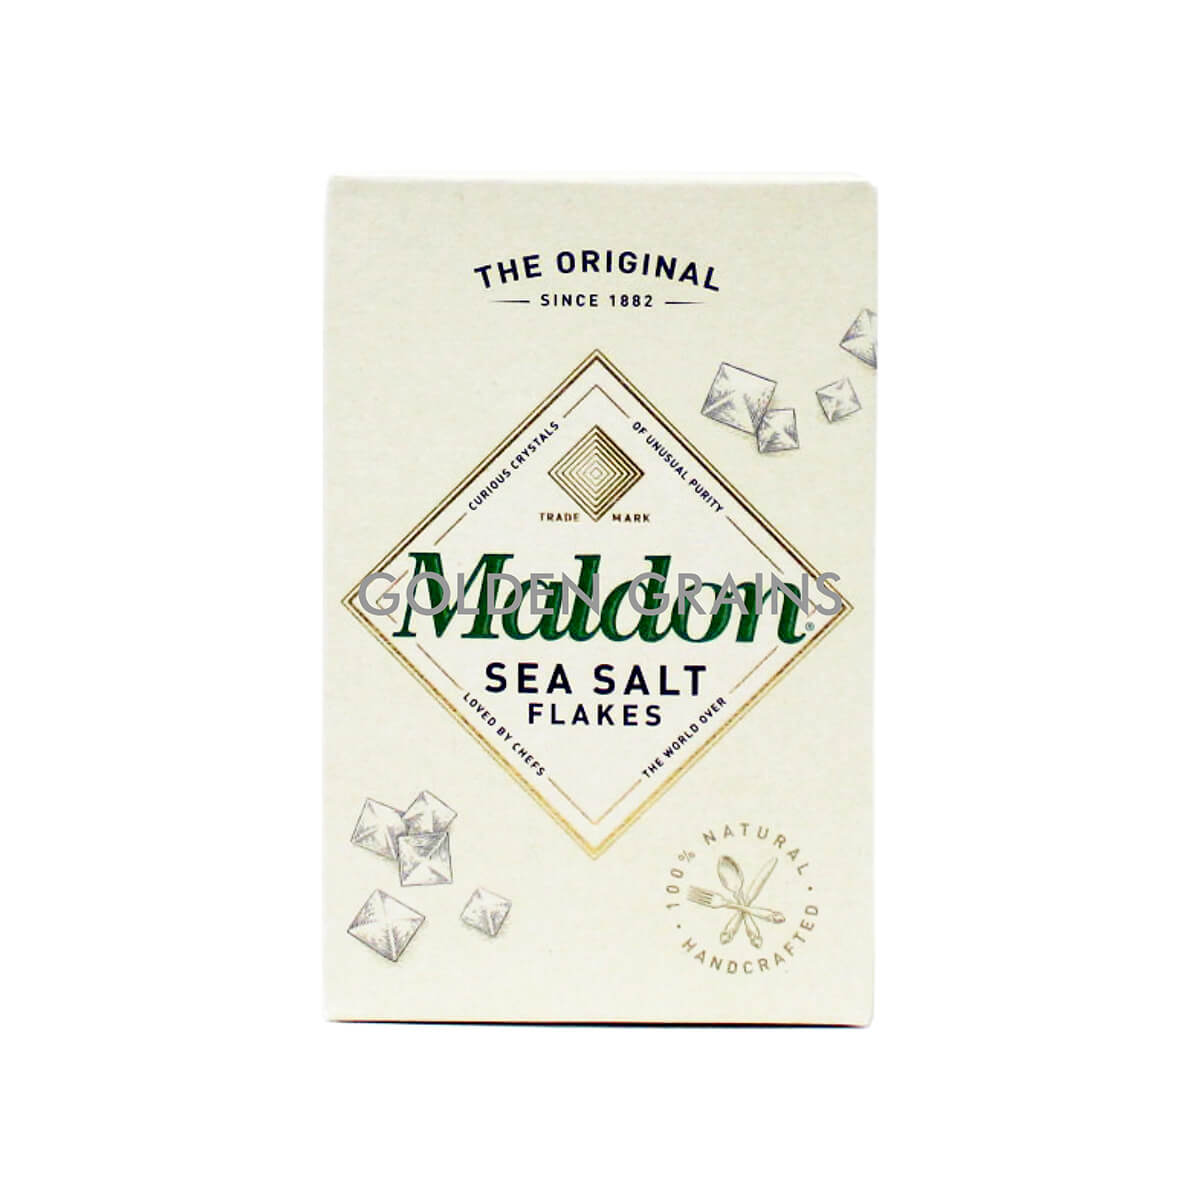 Golden Grains Maldon - Sea Salt - Front.jpg